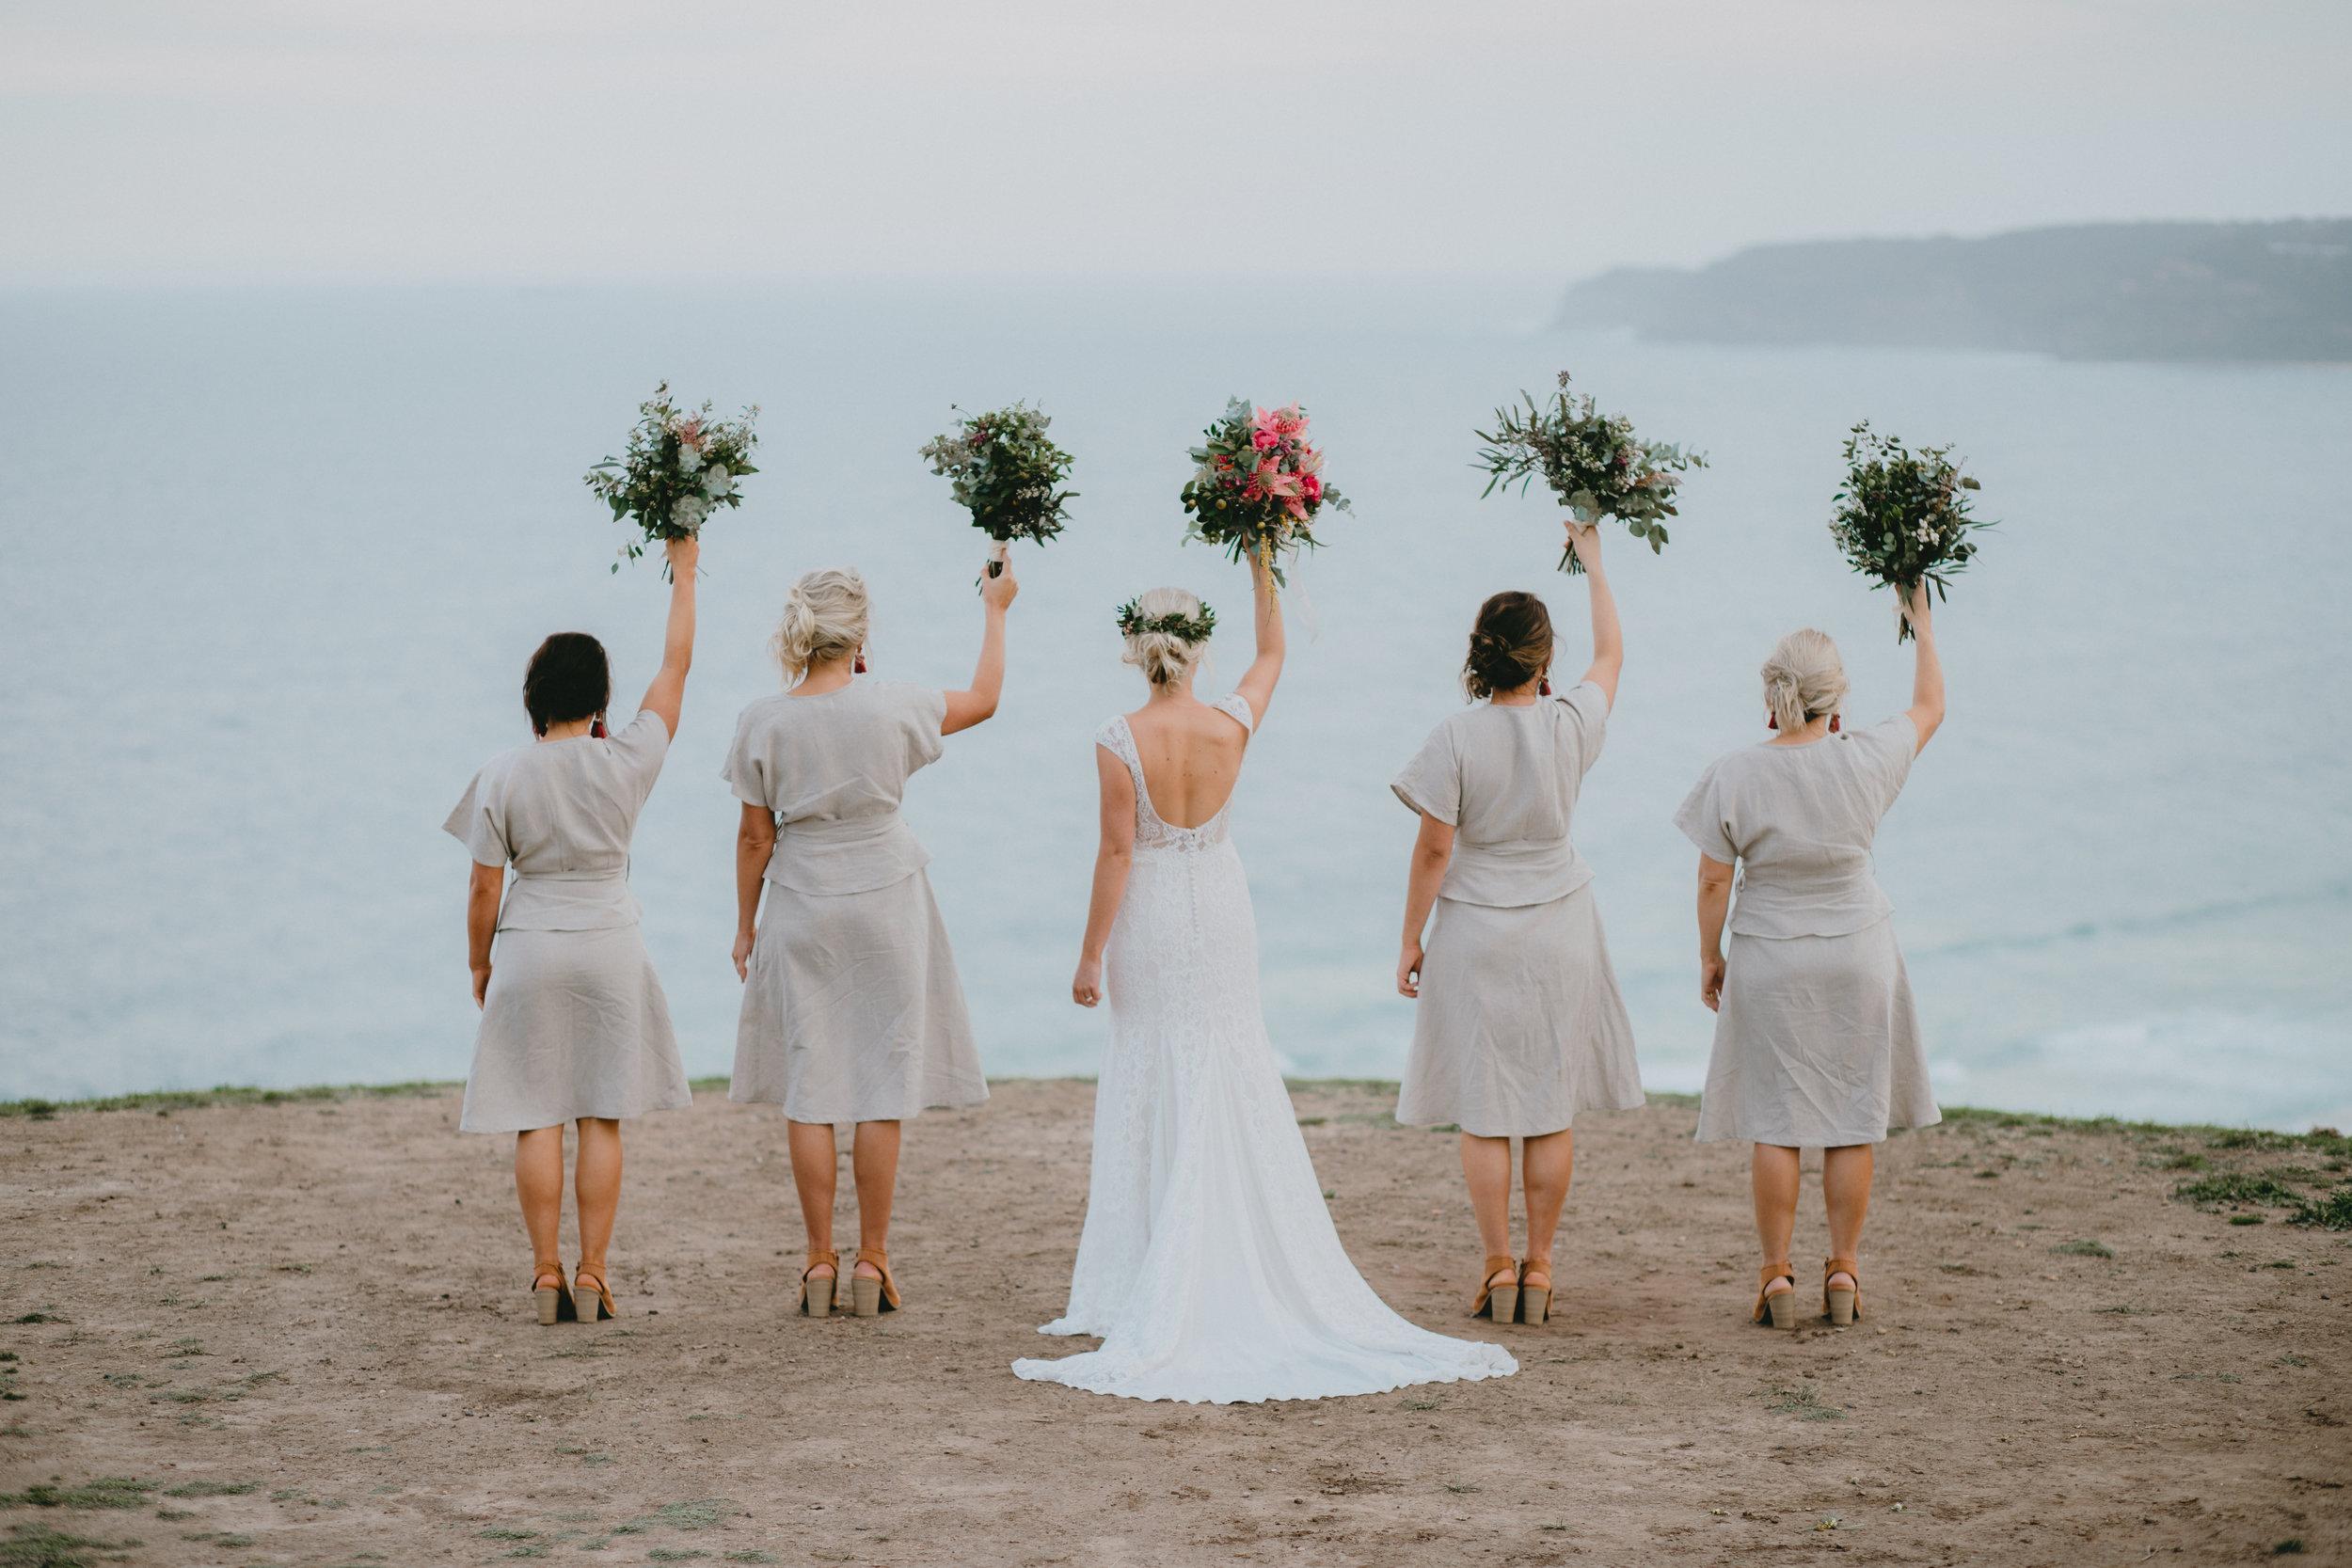 colourful wedding photography by samuel jacob wedding photographer newcastle hunter valley